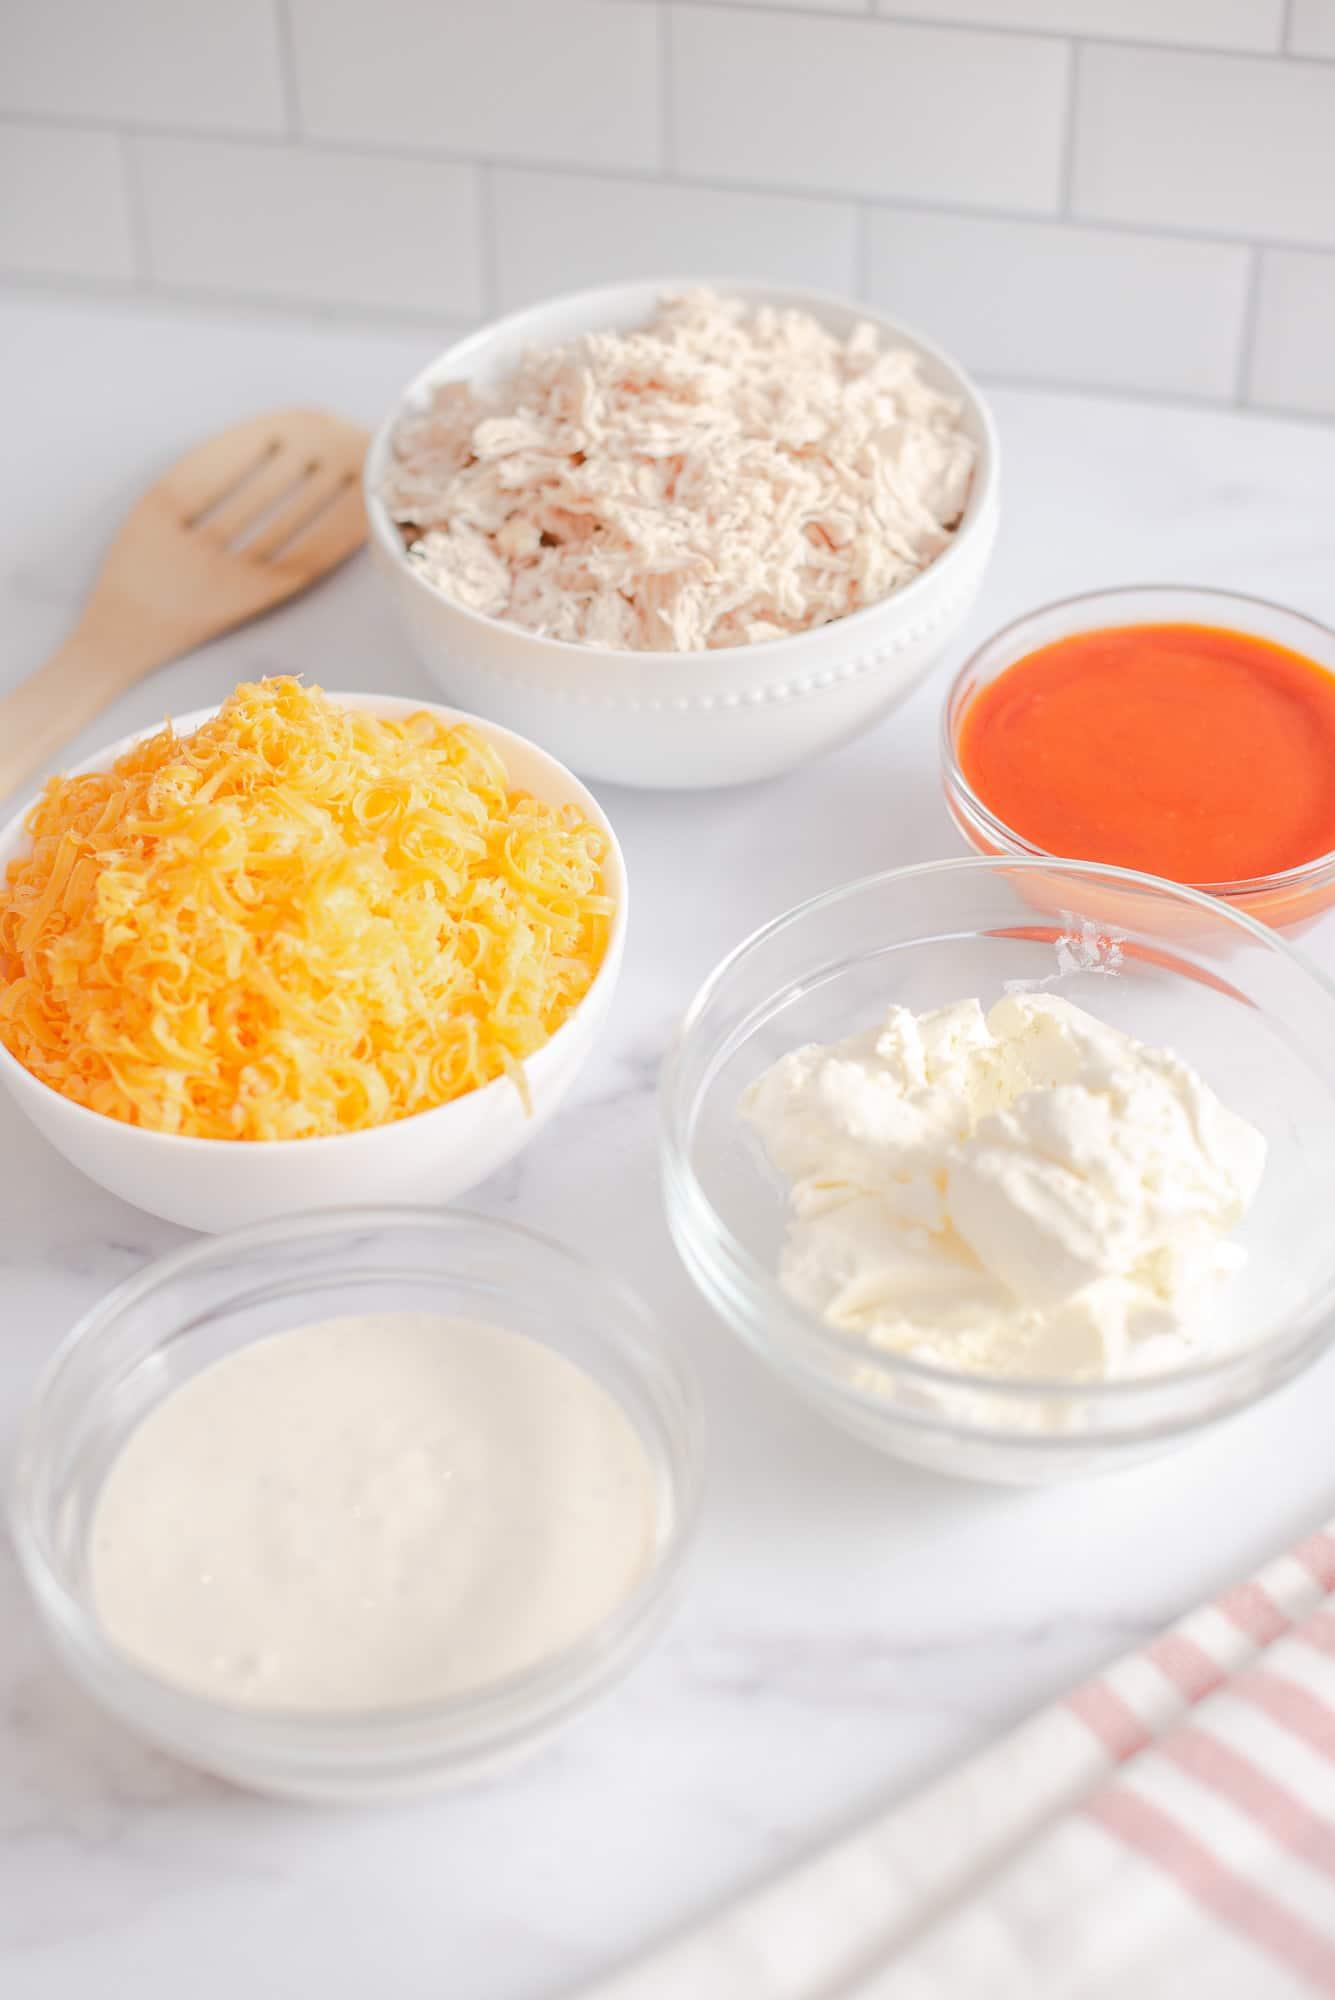 franks buffalo chicken dip ingredients in clear ingredient bowls